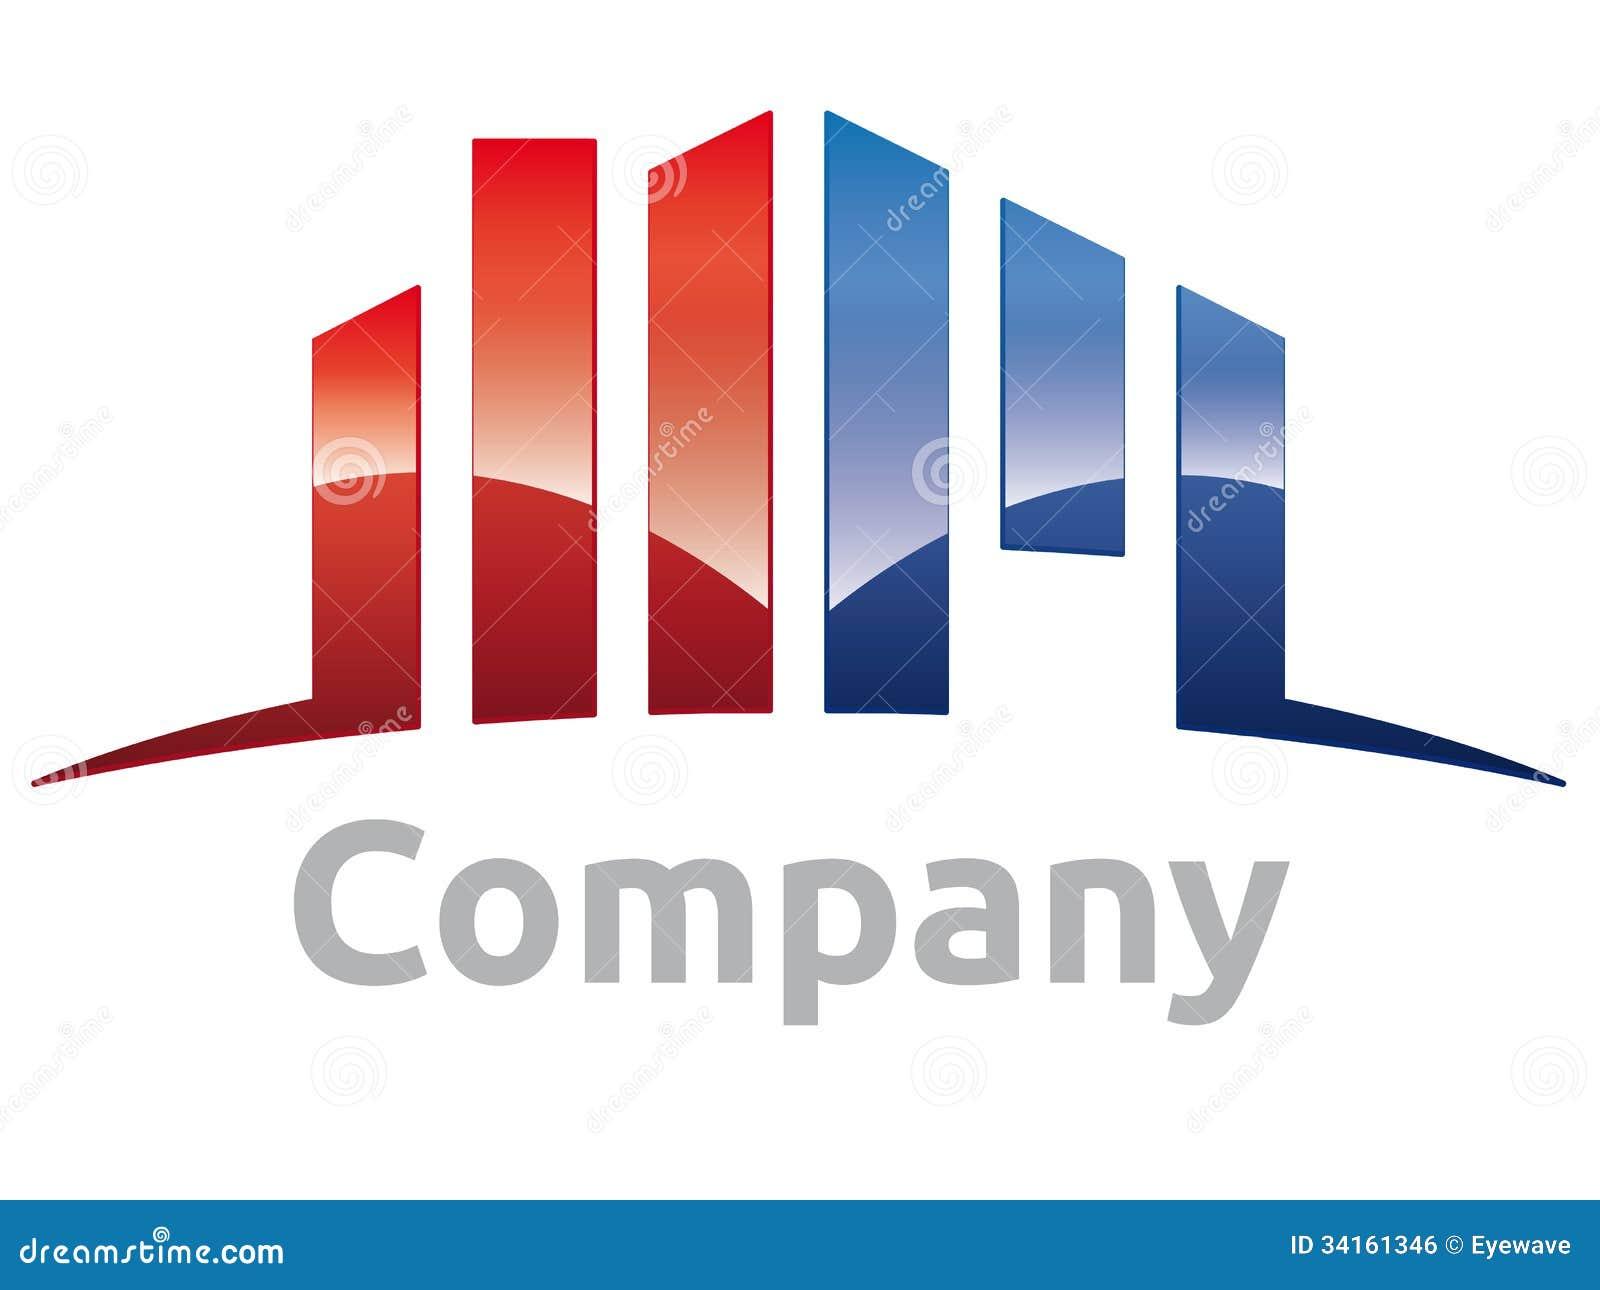 Glossy real estate company vector design element